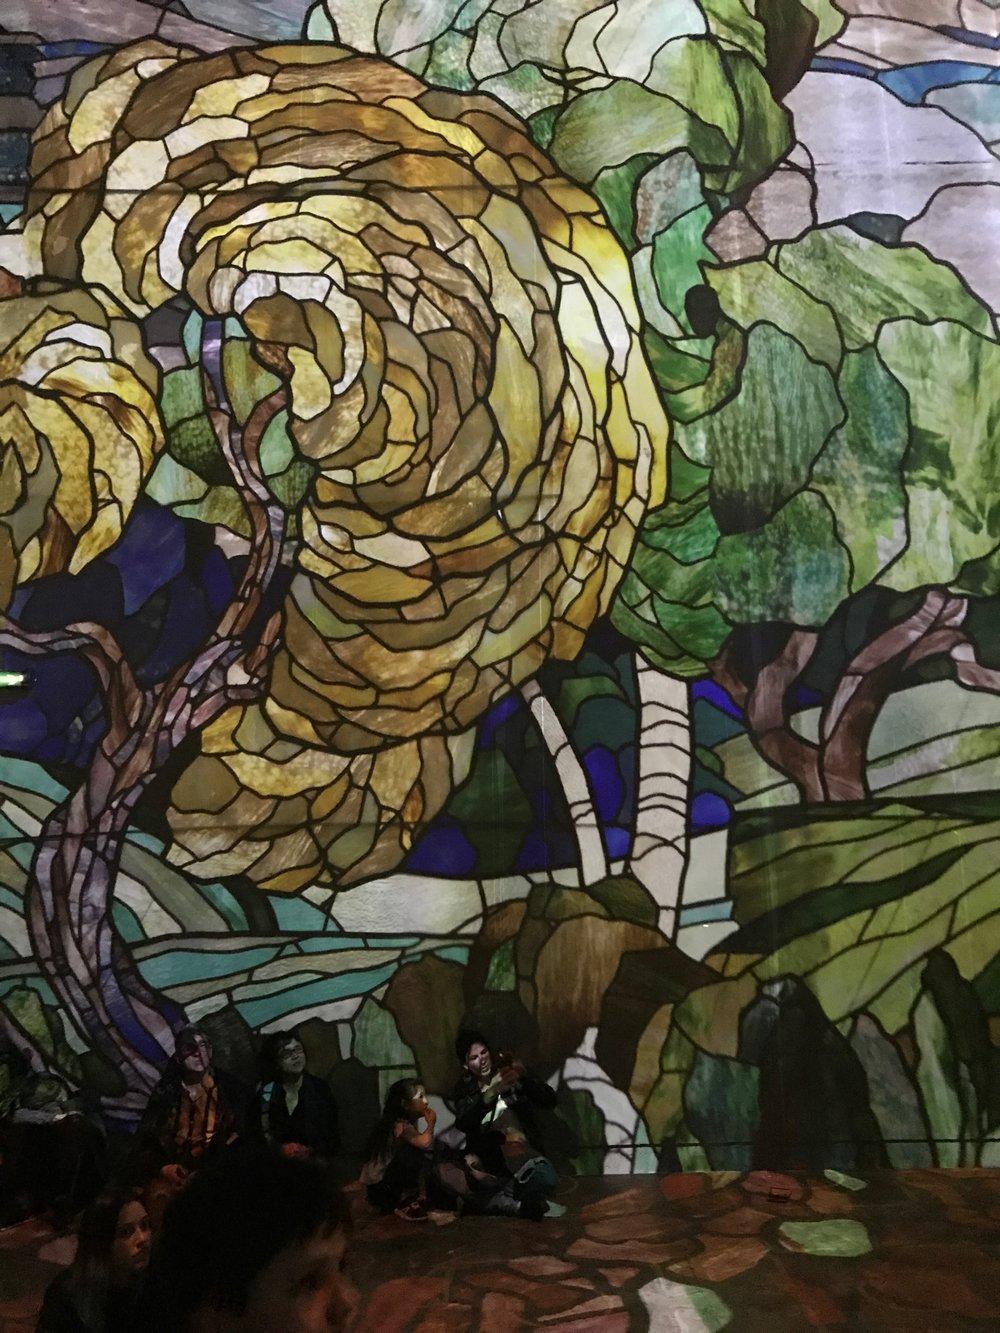 Digital artwork covering the walls of Atlier Luminaries.